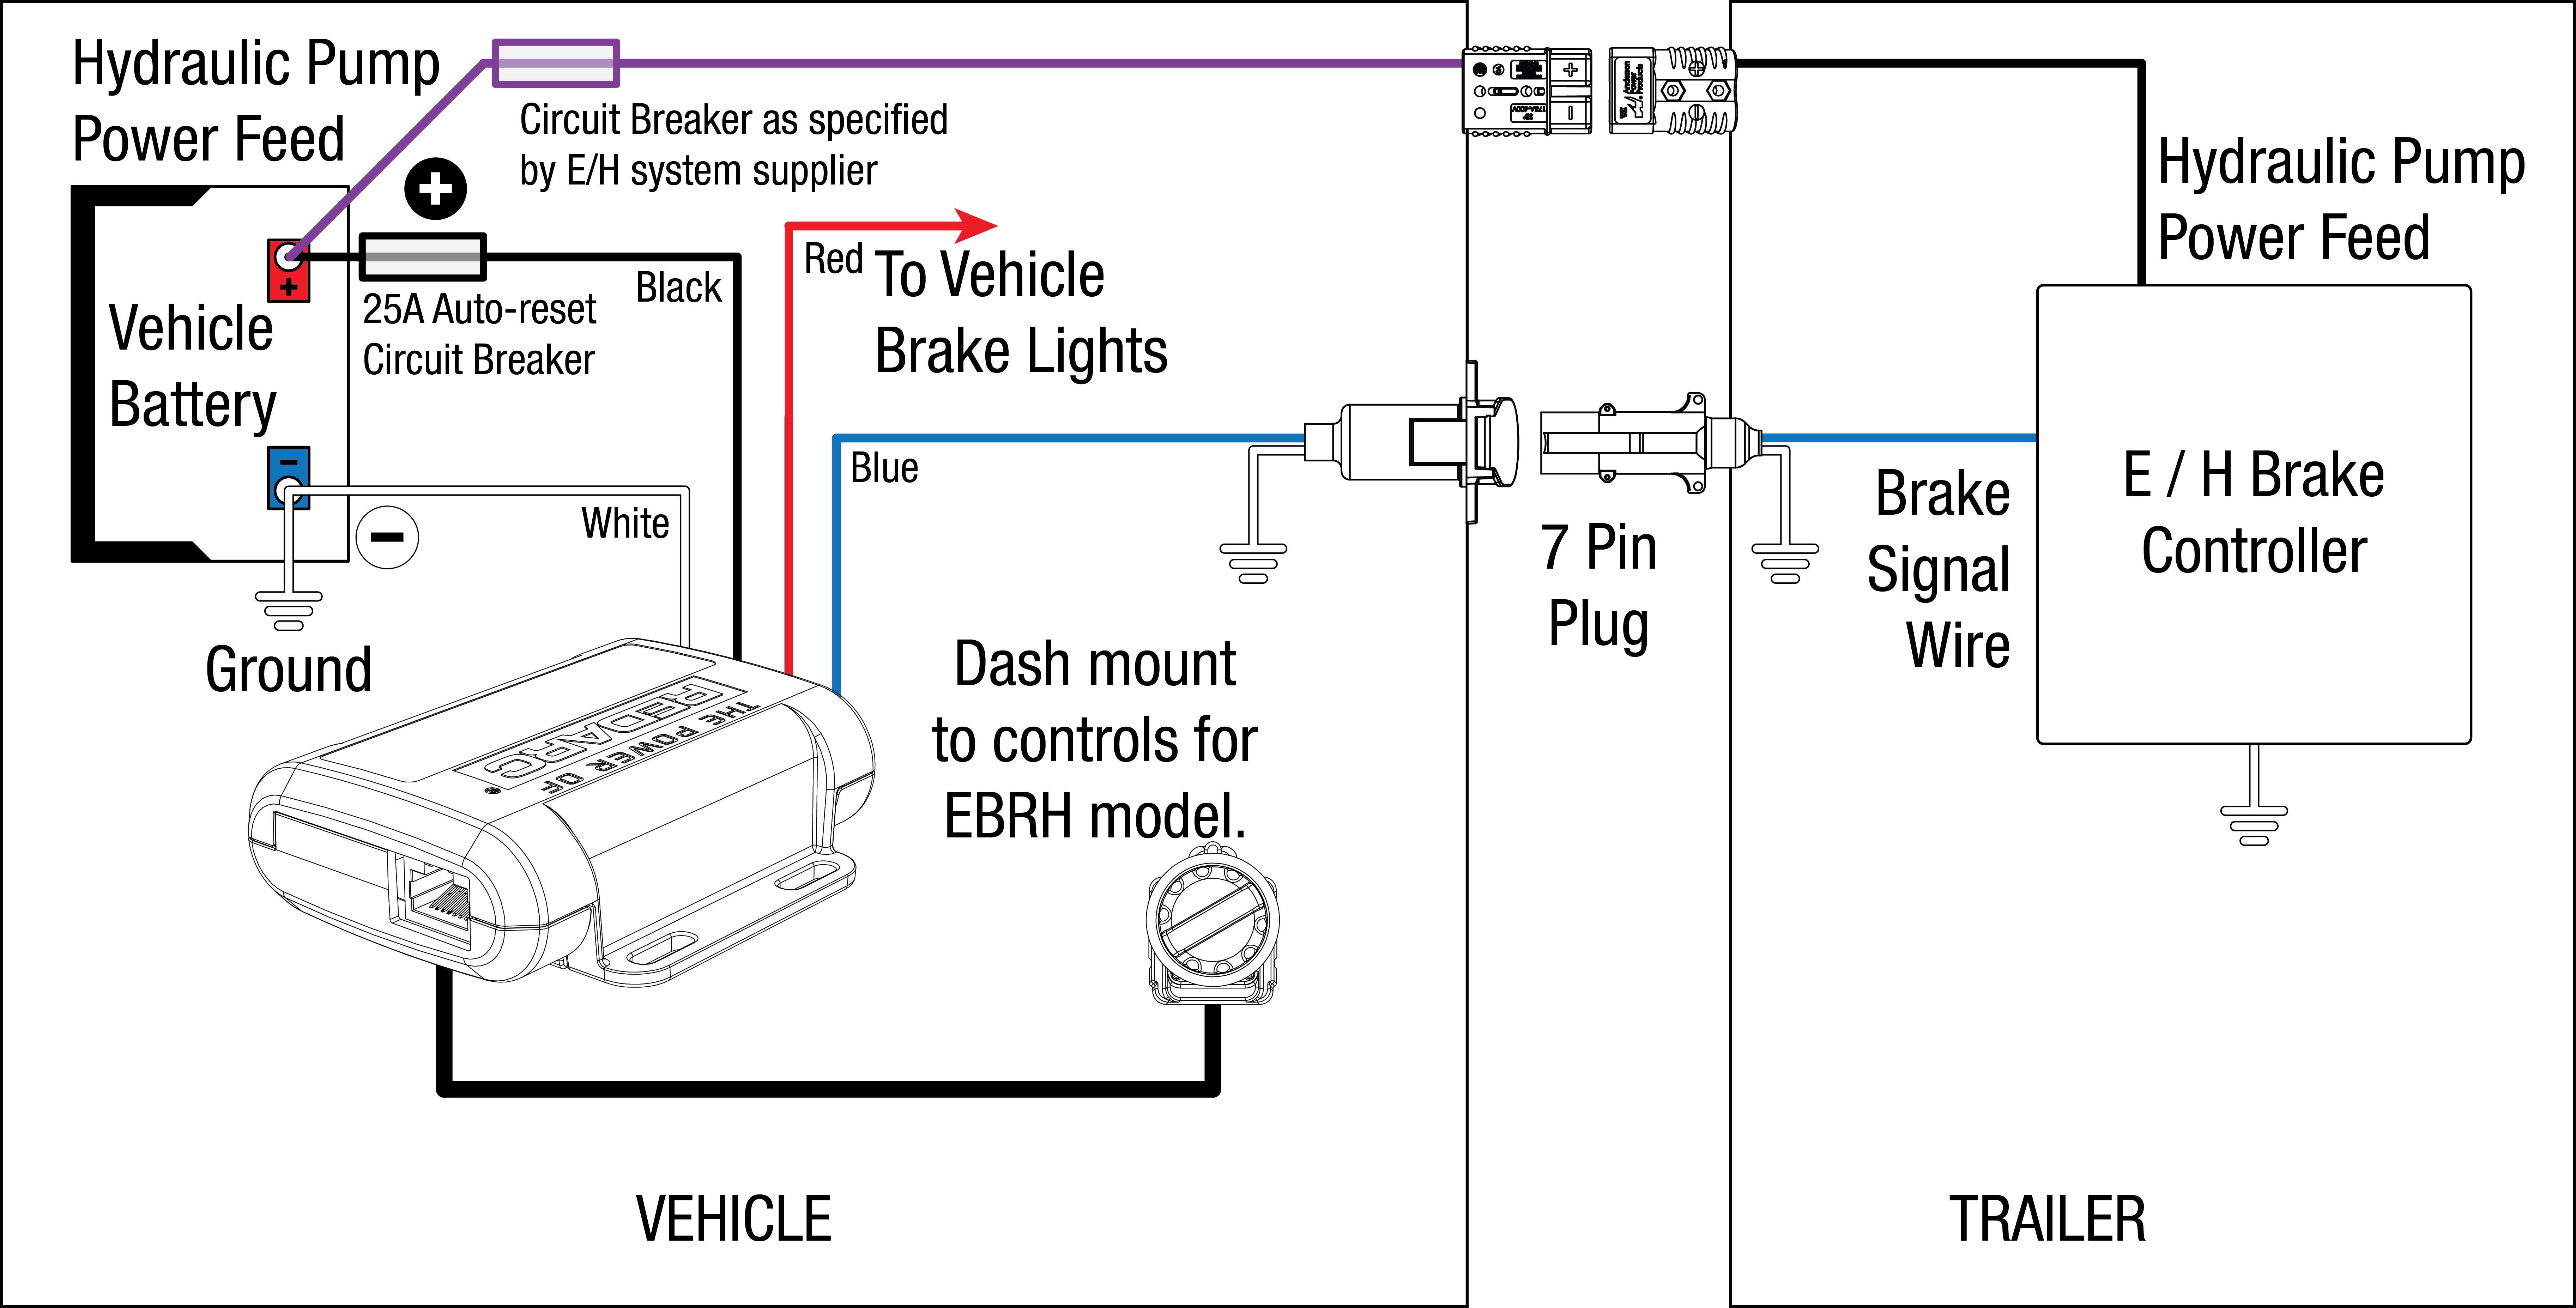 brake controller wiring diagram ford best of wiring diagram image rh mainetreasurechest com cequent brake control wiring diagram tekonsha voyager brake control wiring diagram